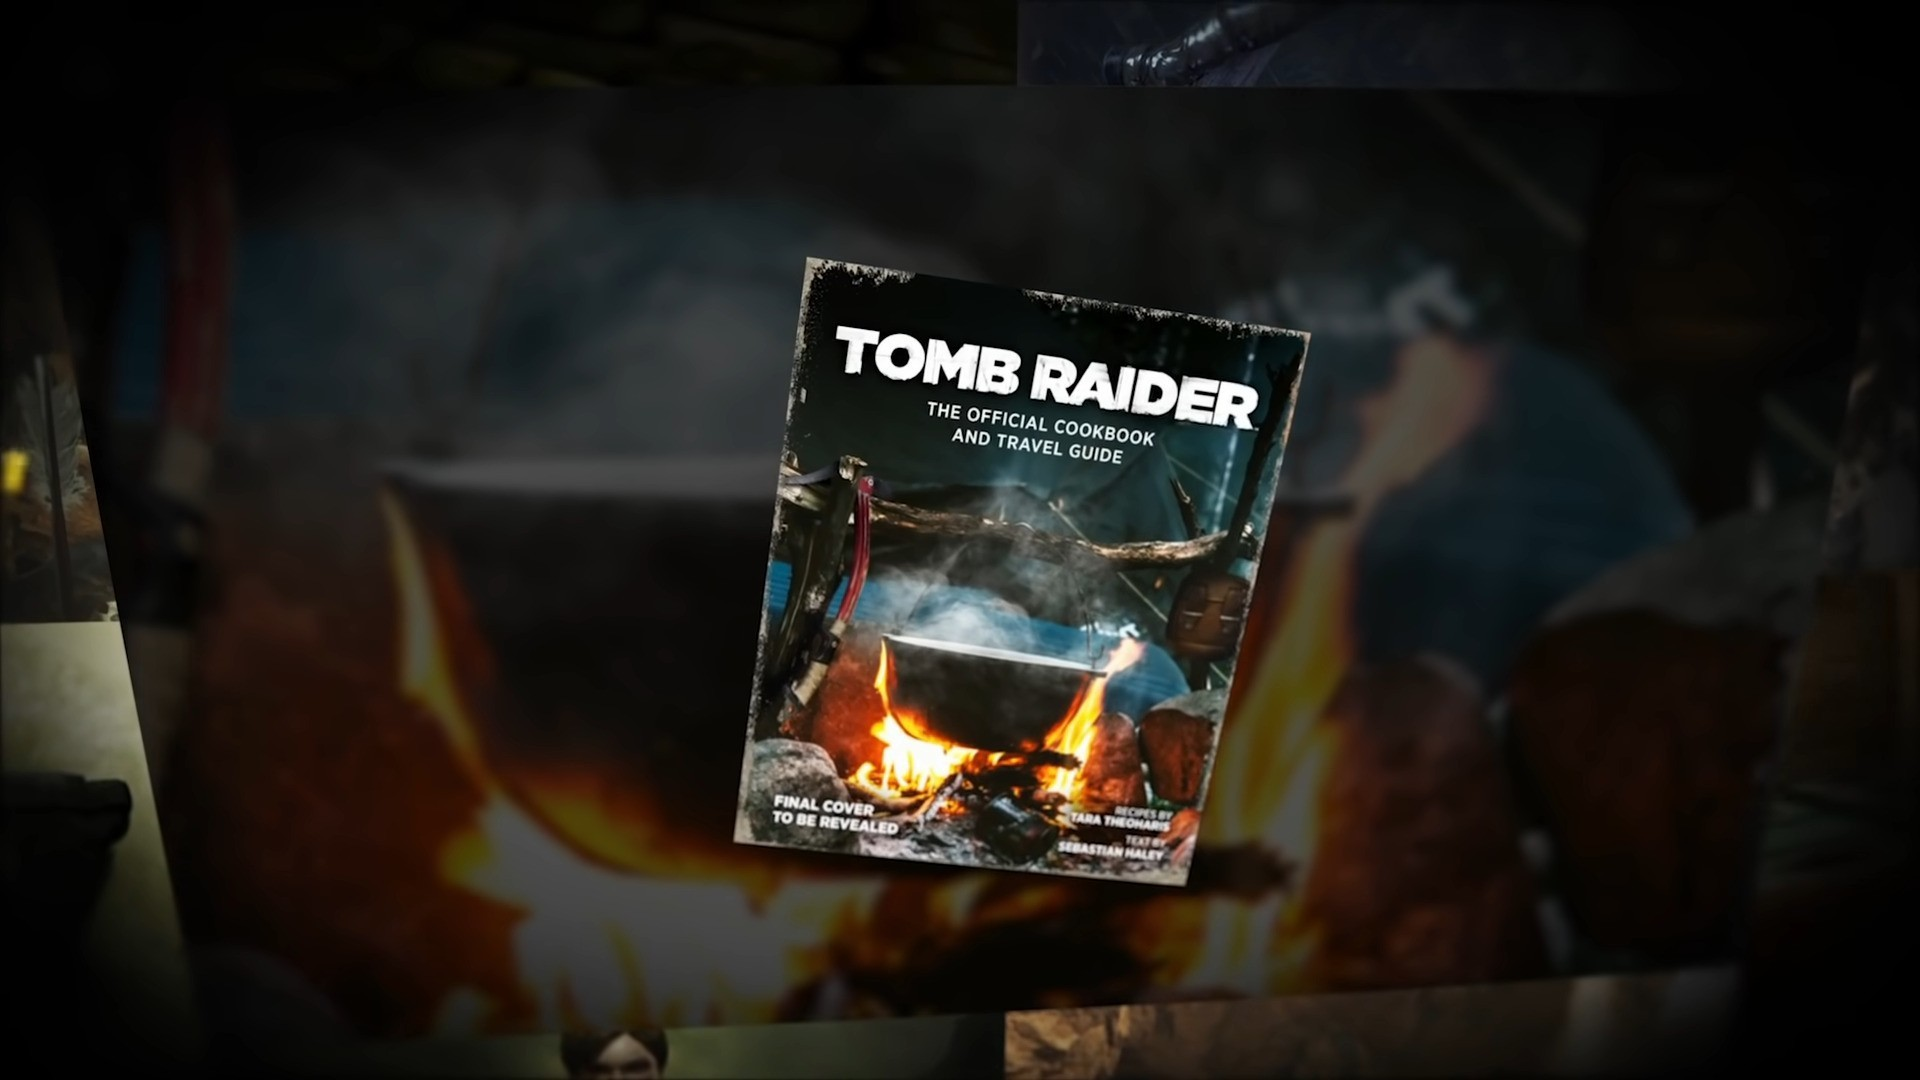 Tomb Raider Cookbook